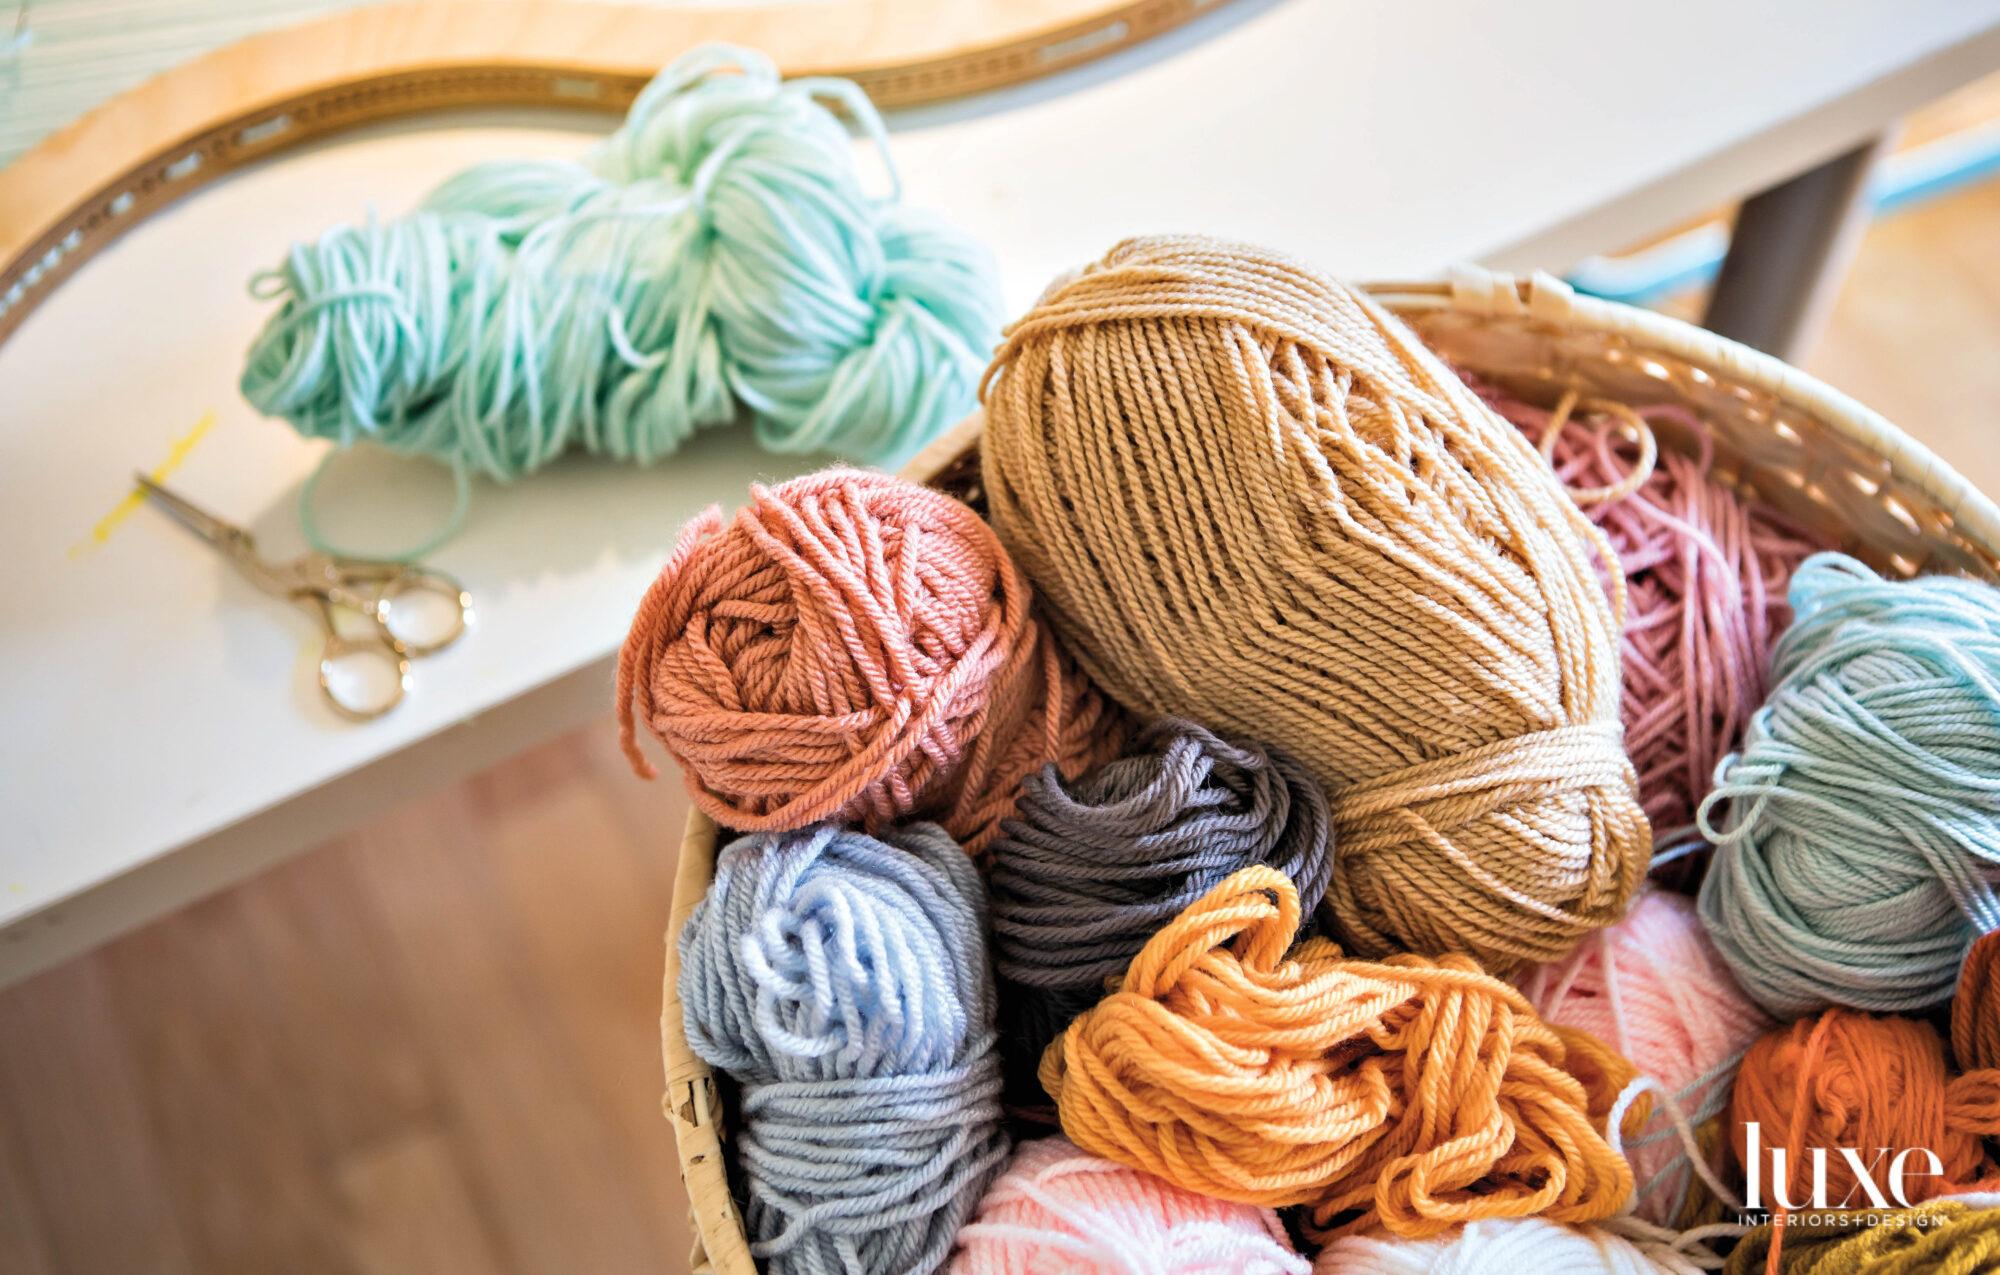 a basket of colorful yarn sits in artist Hayley Sheldon's studio